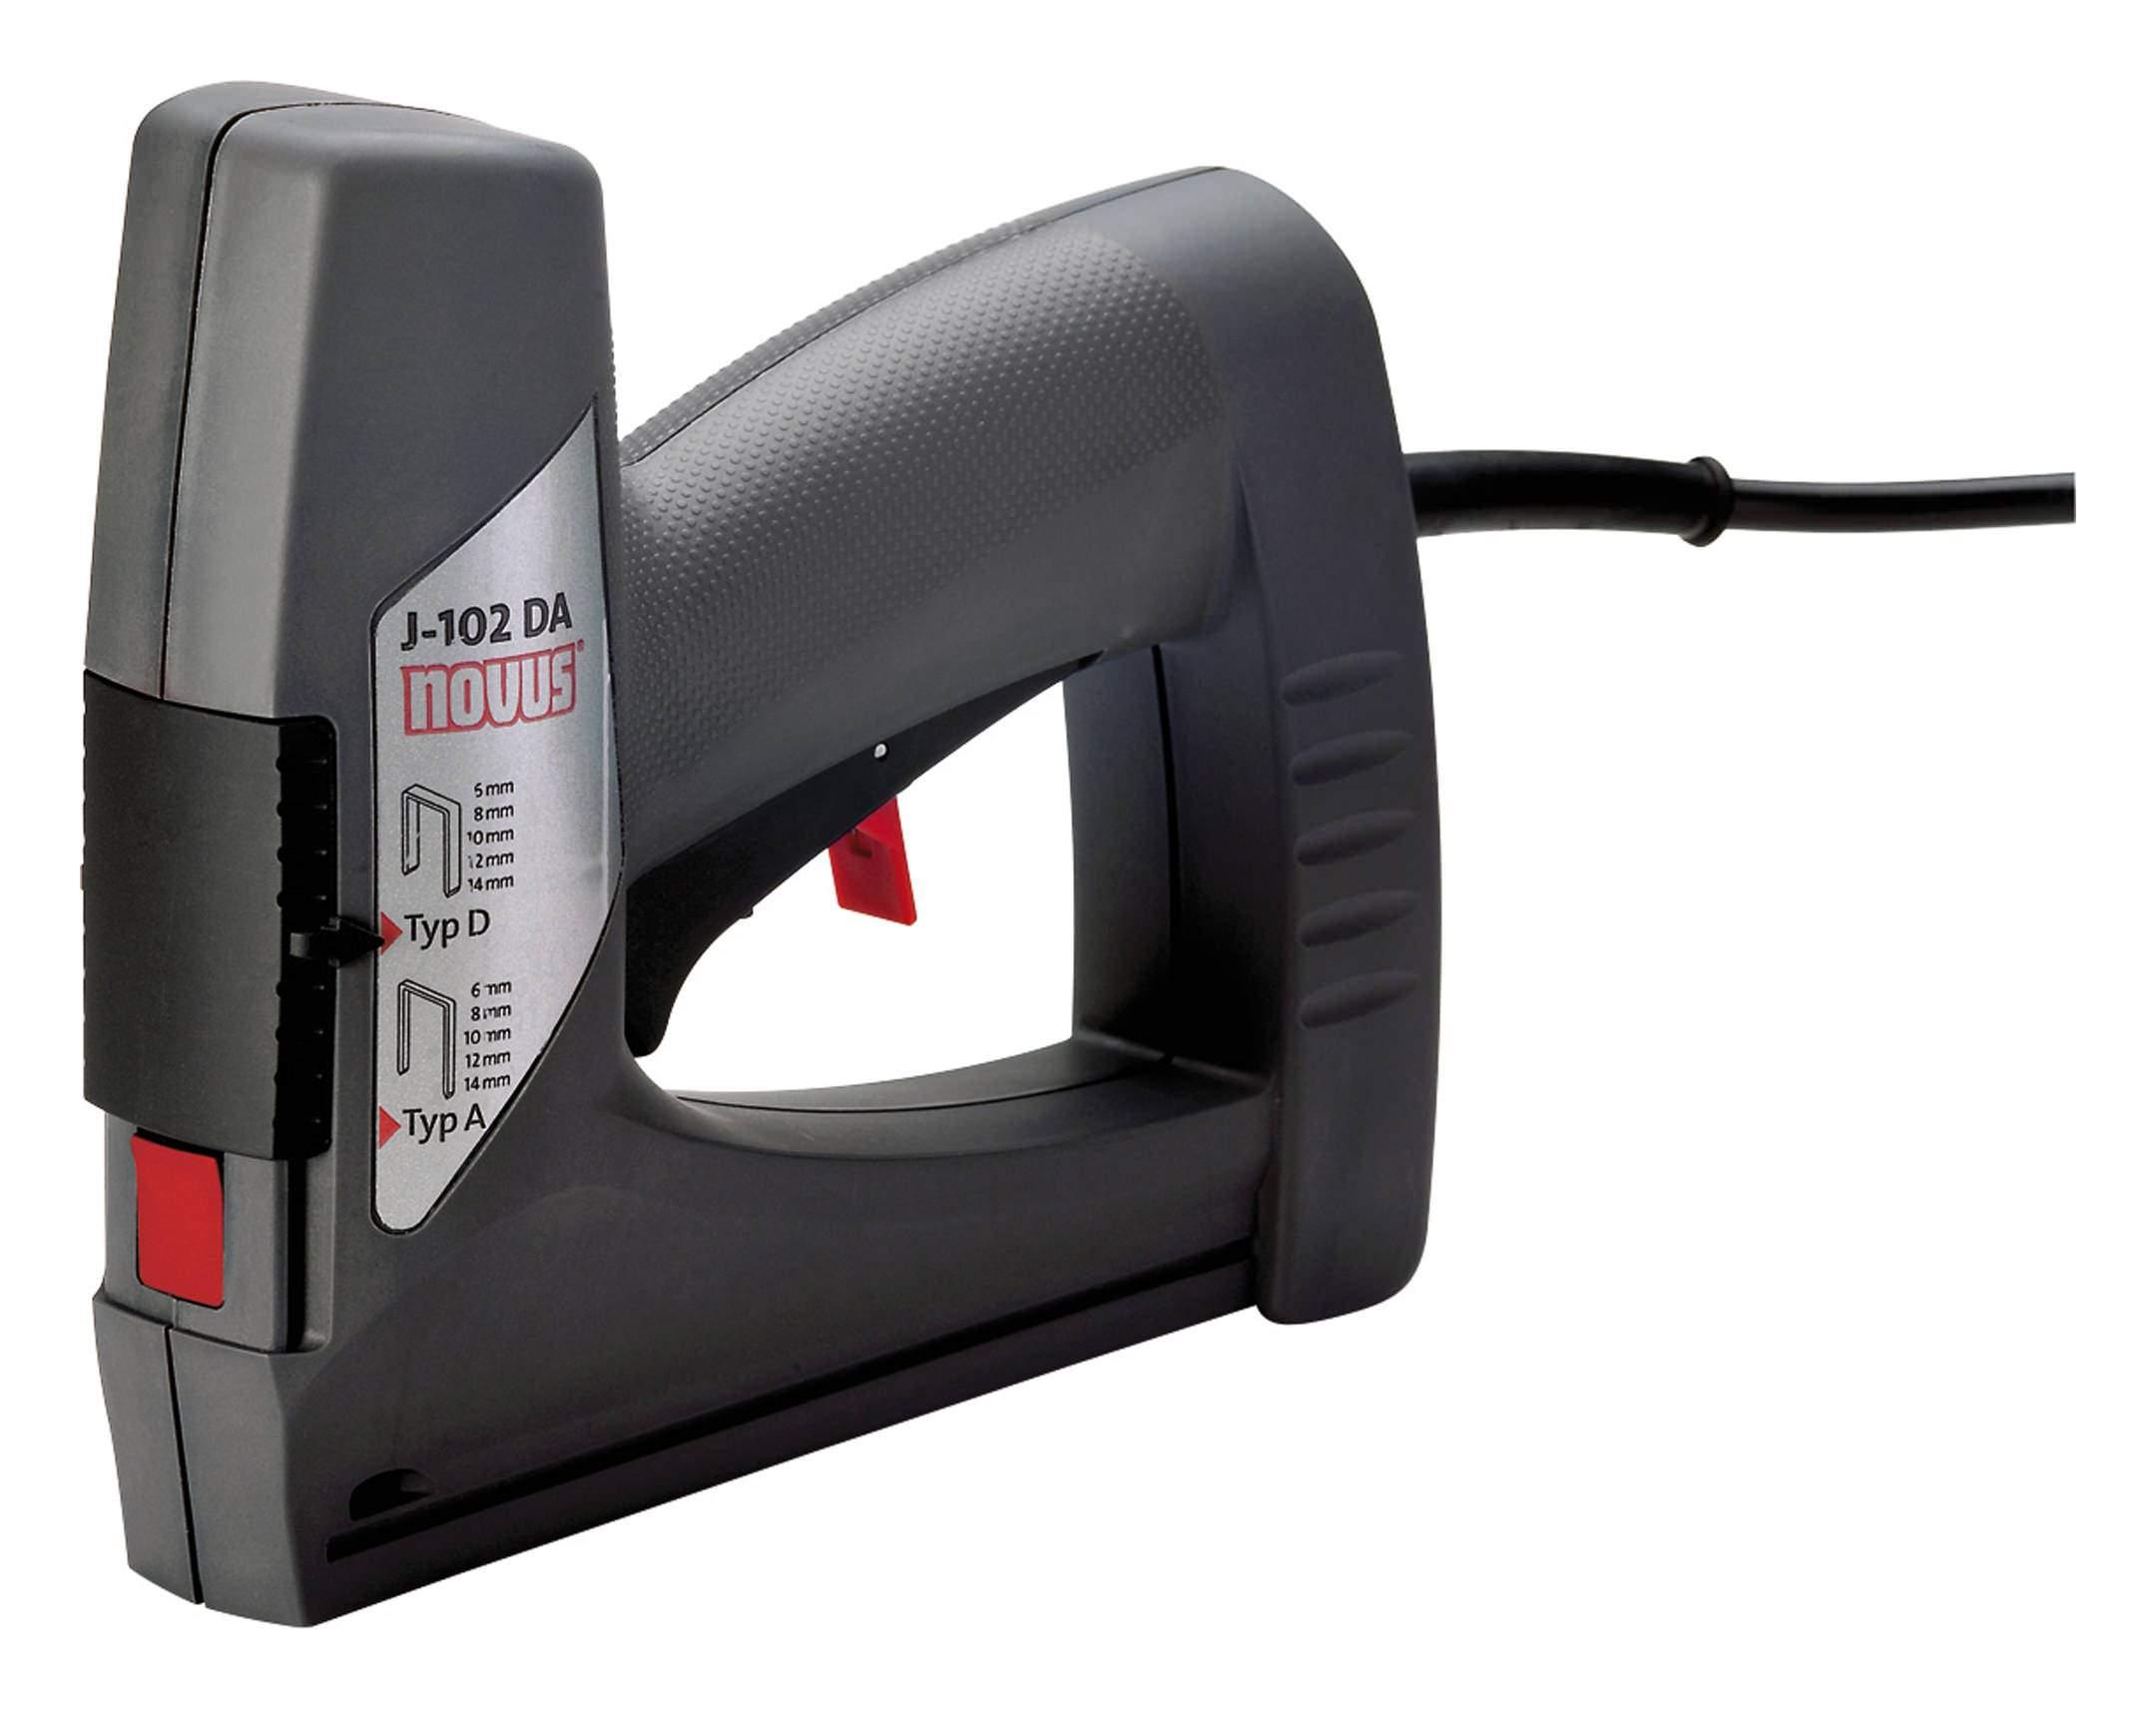 Novus Elektrotacker J 102 DA - 031-0354